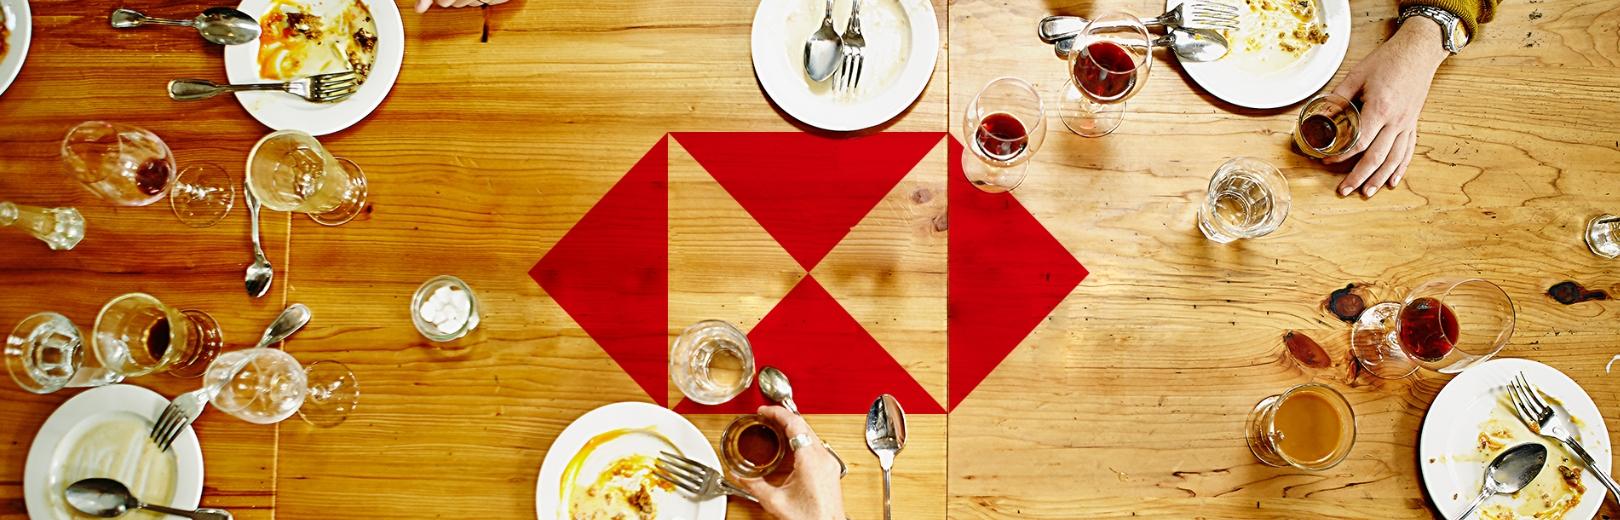 HSBC table scene